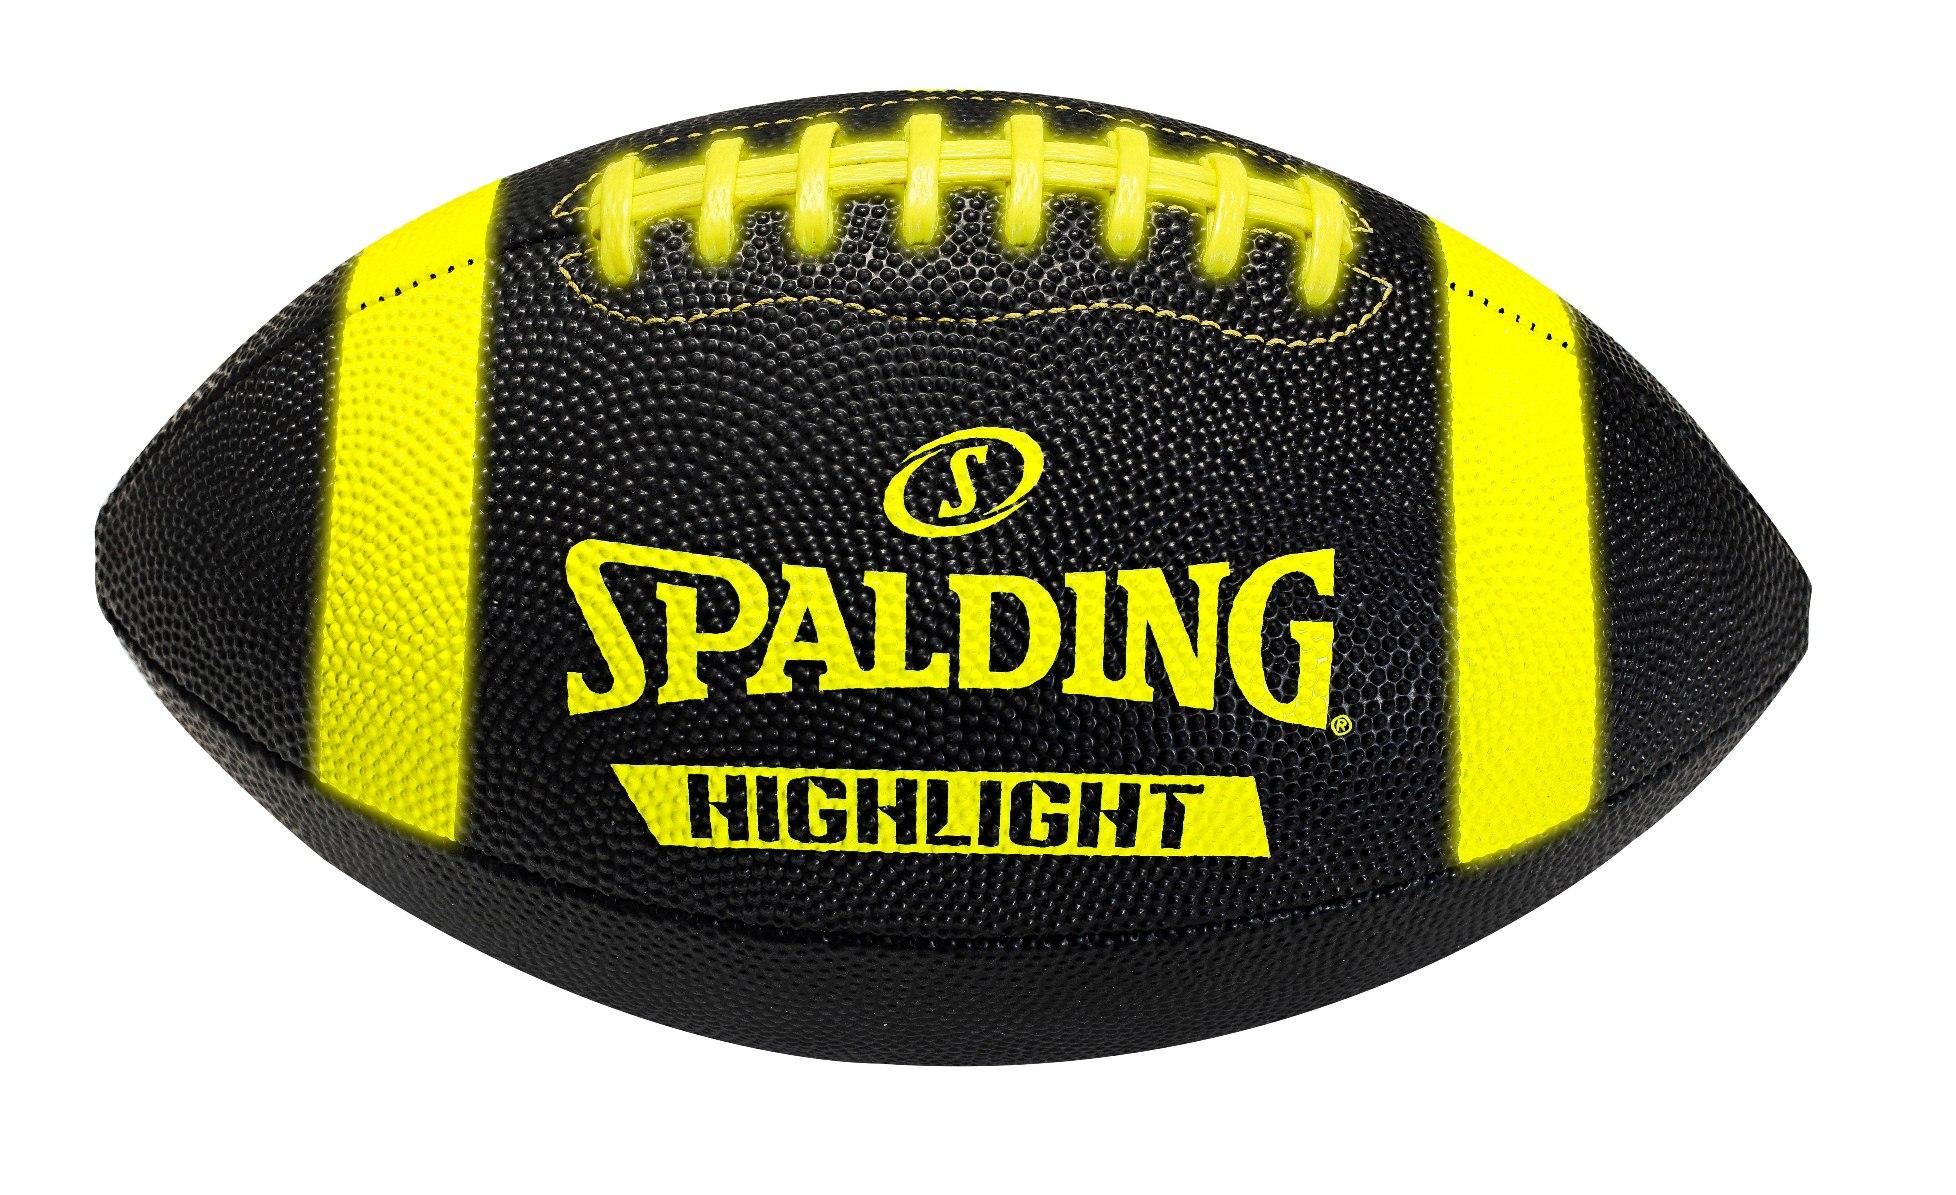 Spalding Highlight Junior Football - SPALDING SPORTS WORLDWIDE